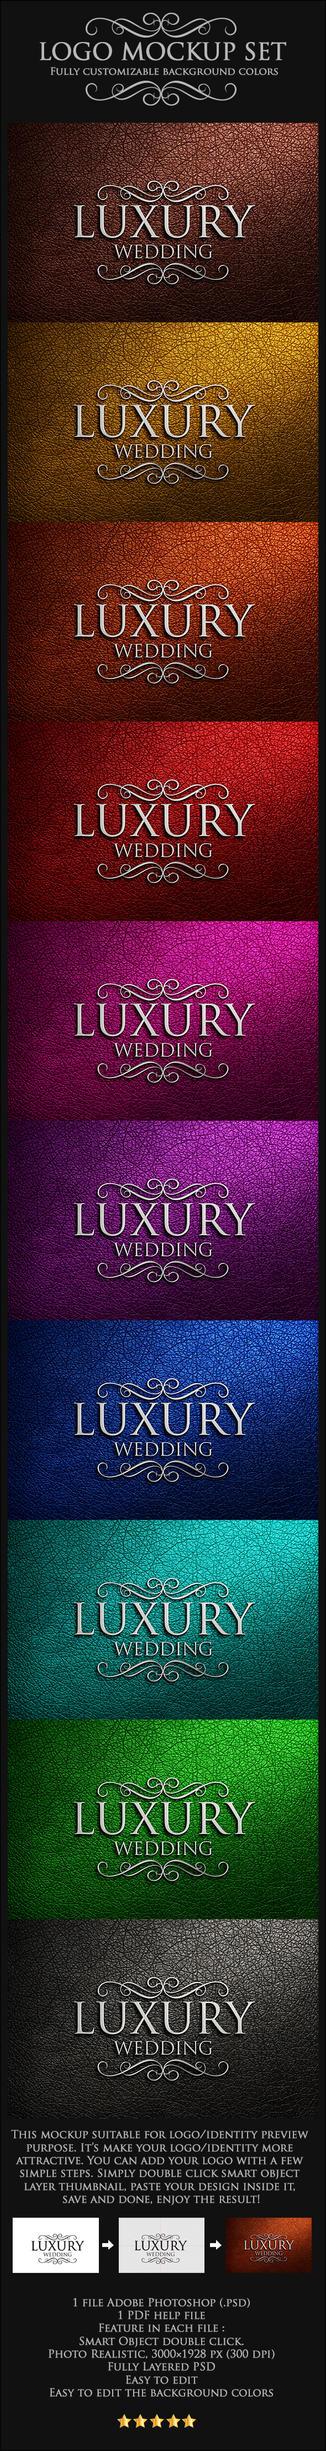 Luxury Wedding by rogeriomarcos